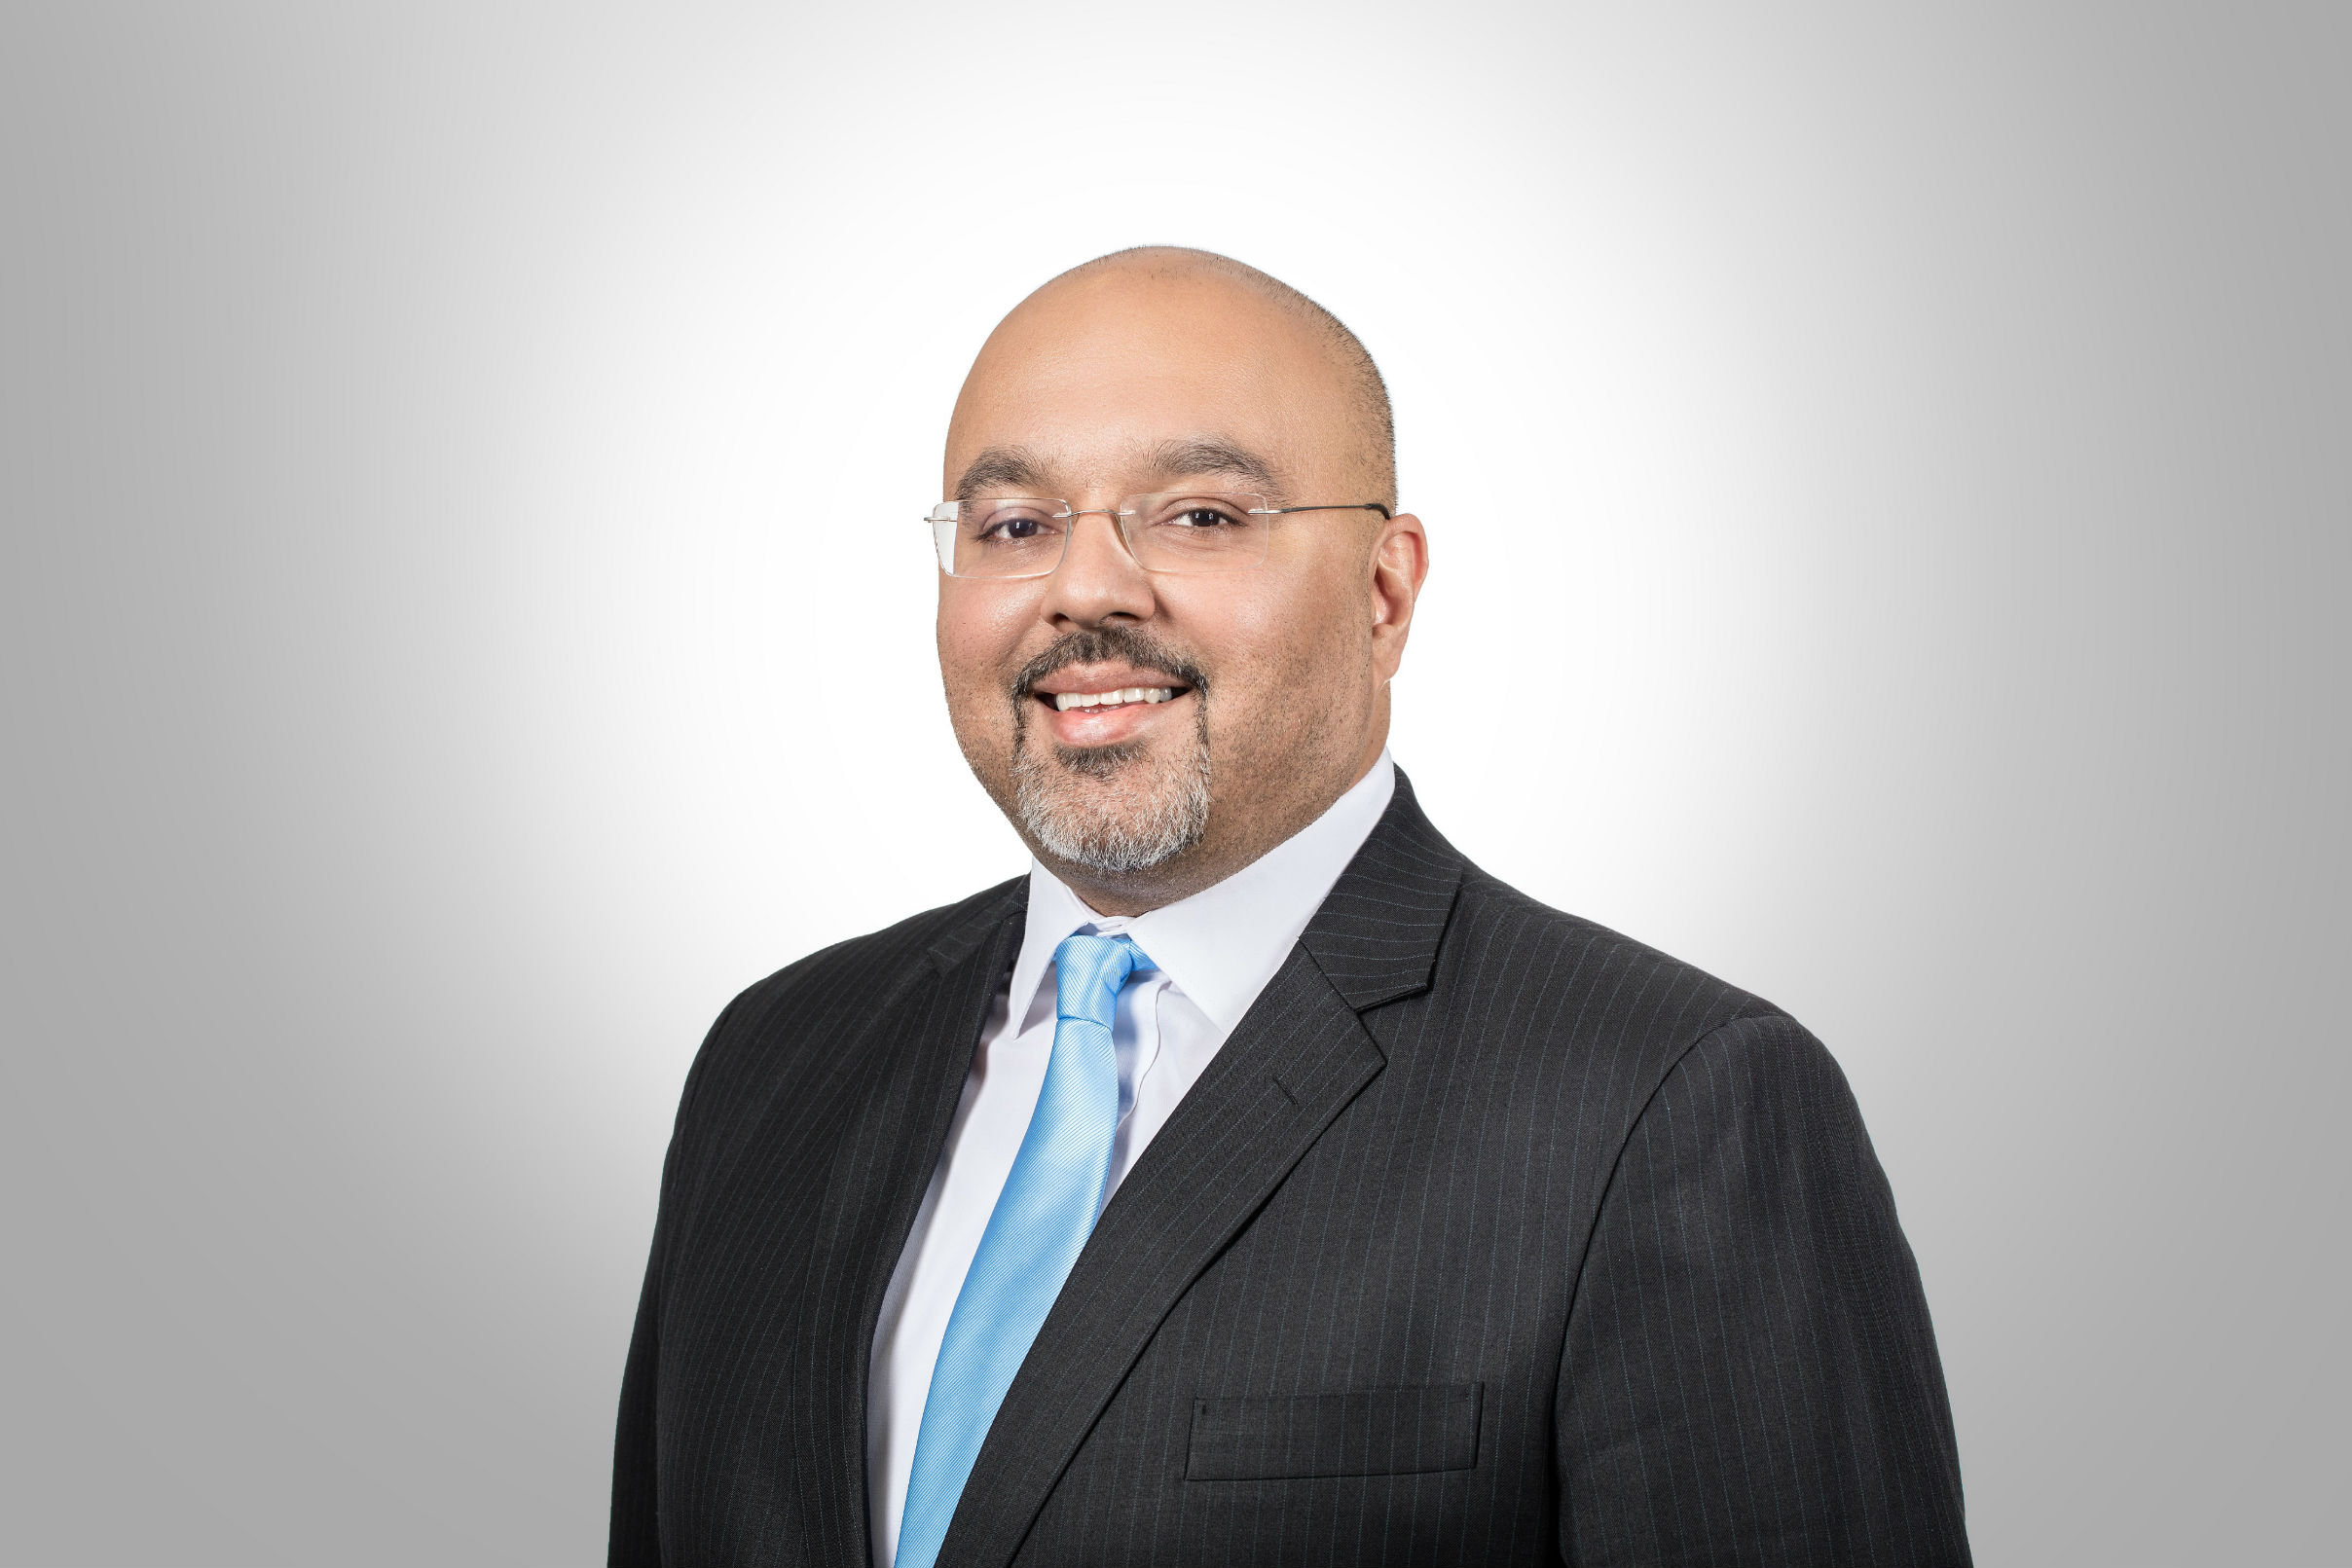 Bahrain Economic Development Board to help plug midscale hotel market gap